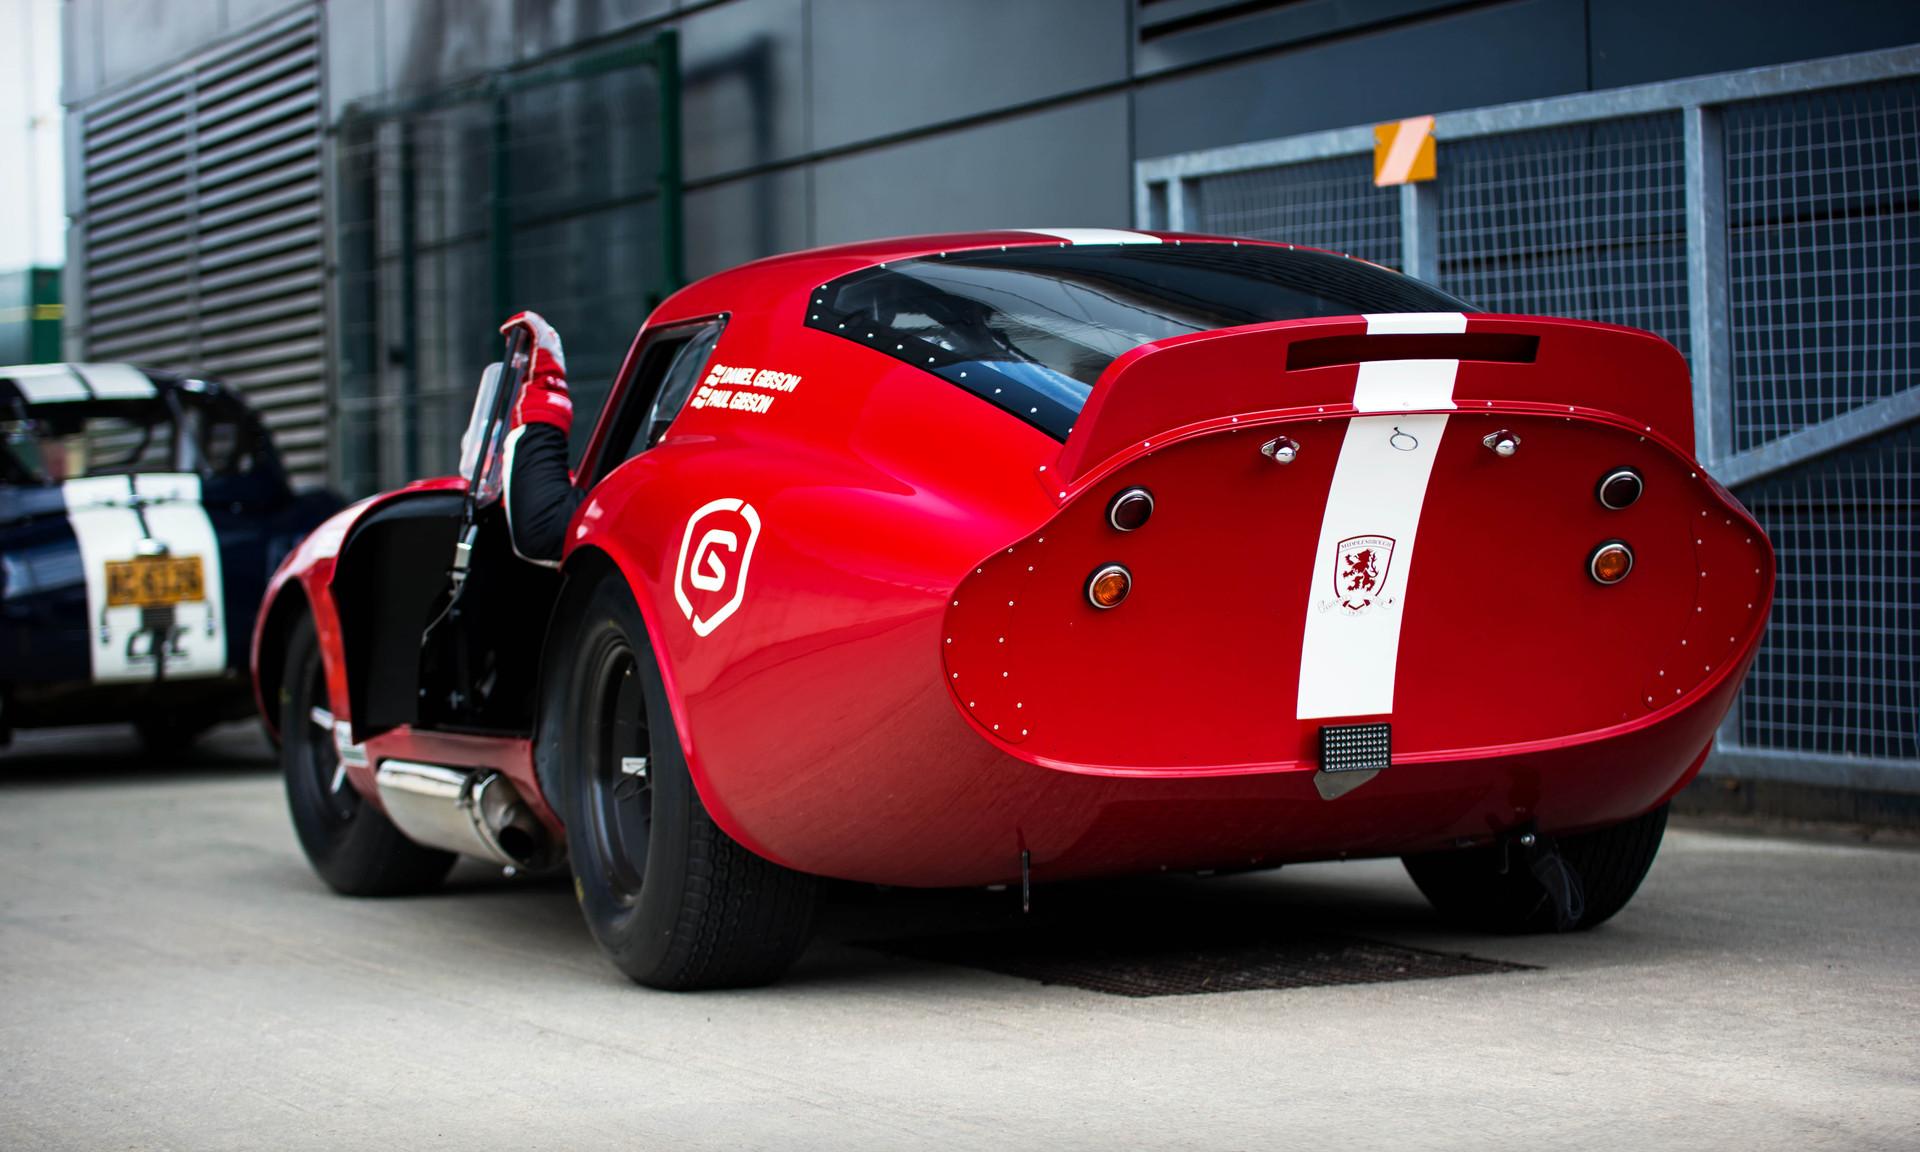 Daniel & Paul Gibson's Shelby Daytona Cobra